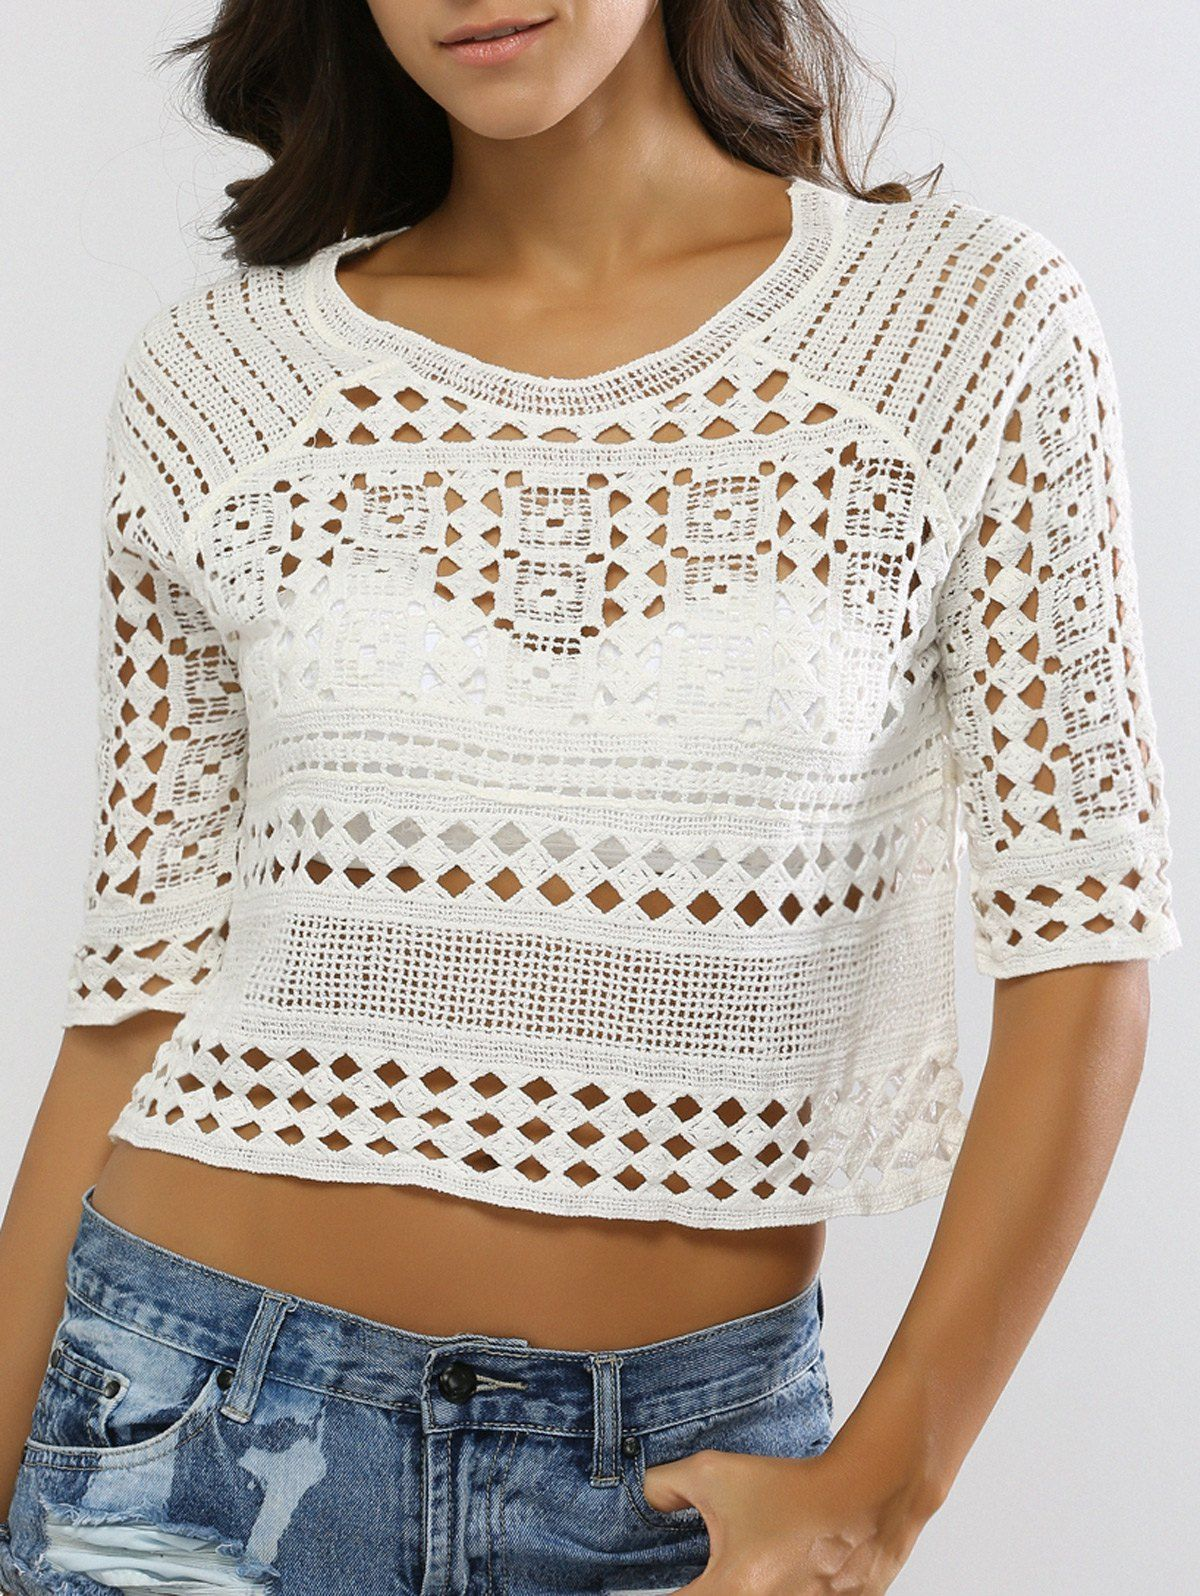 Crop Top   Hollow Out Crochet Knit Crop Top #fashion #style #croptop #crochet